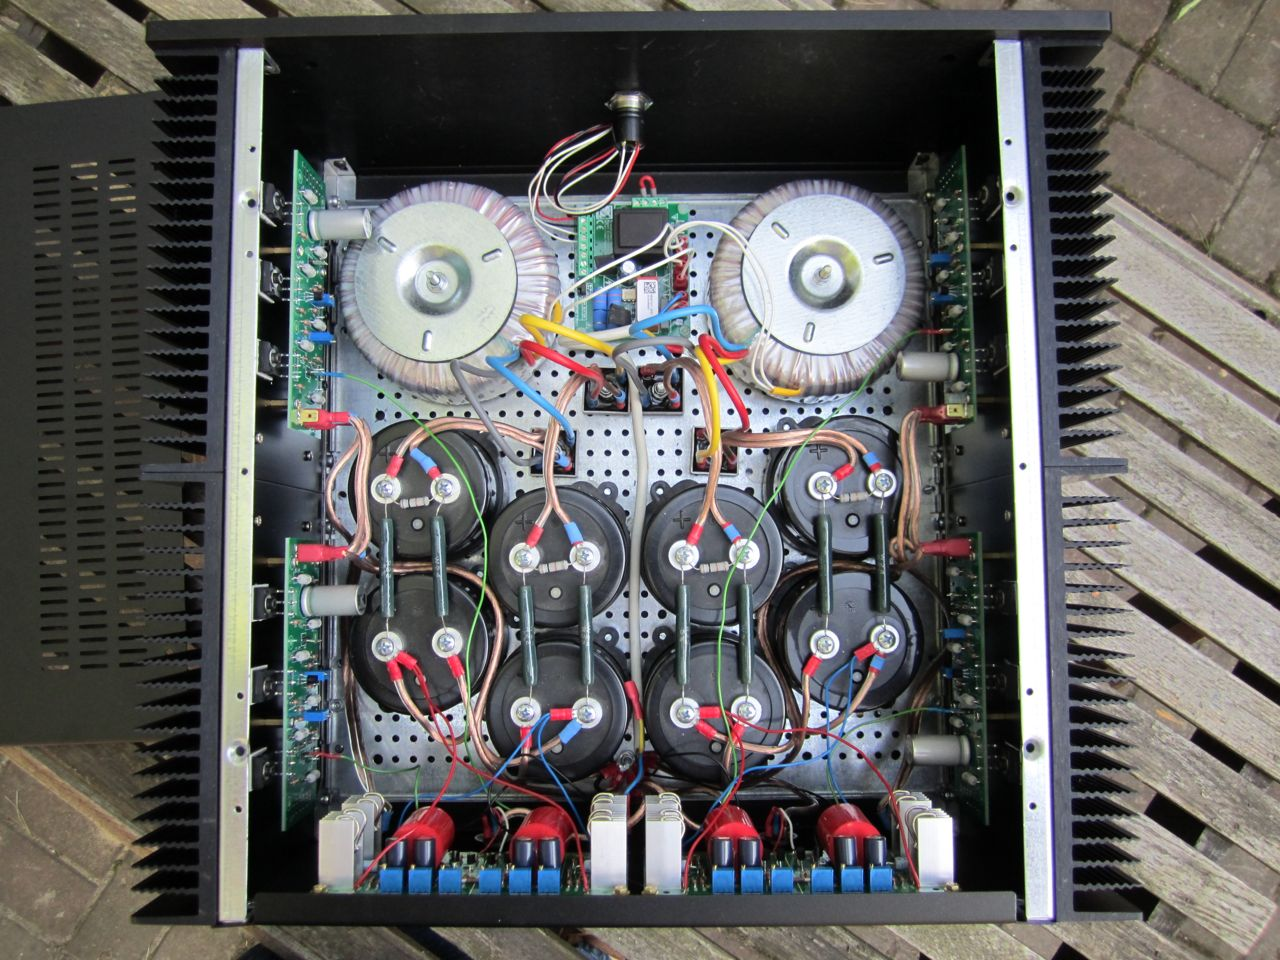 Diyaudio My Diy Projects Help With Volume Control On A Headphone Amplifier Burning Amp Ba 3b Balanced